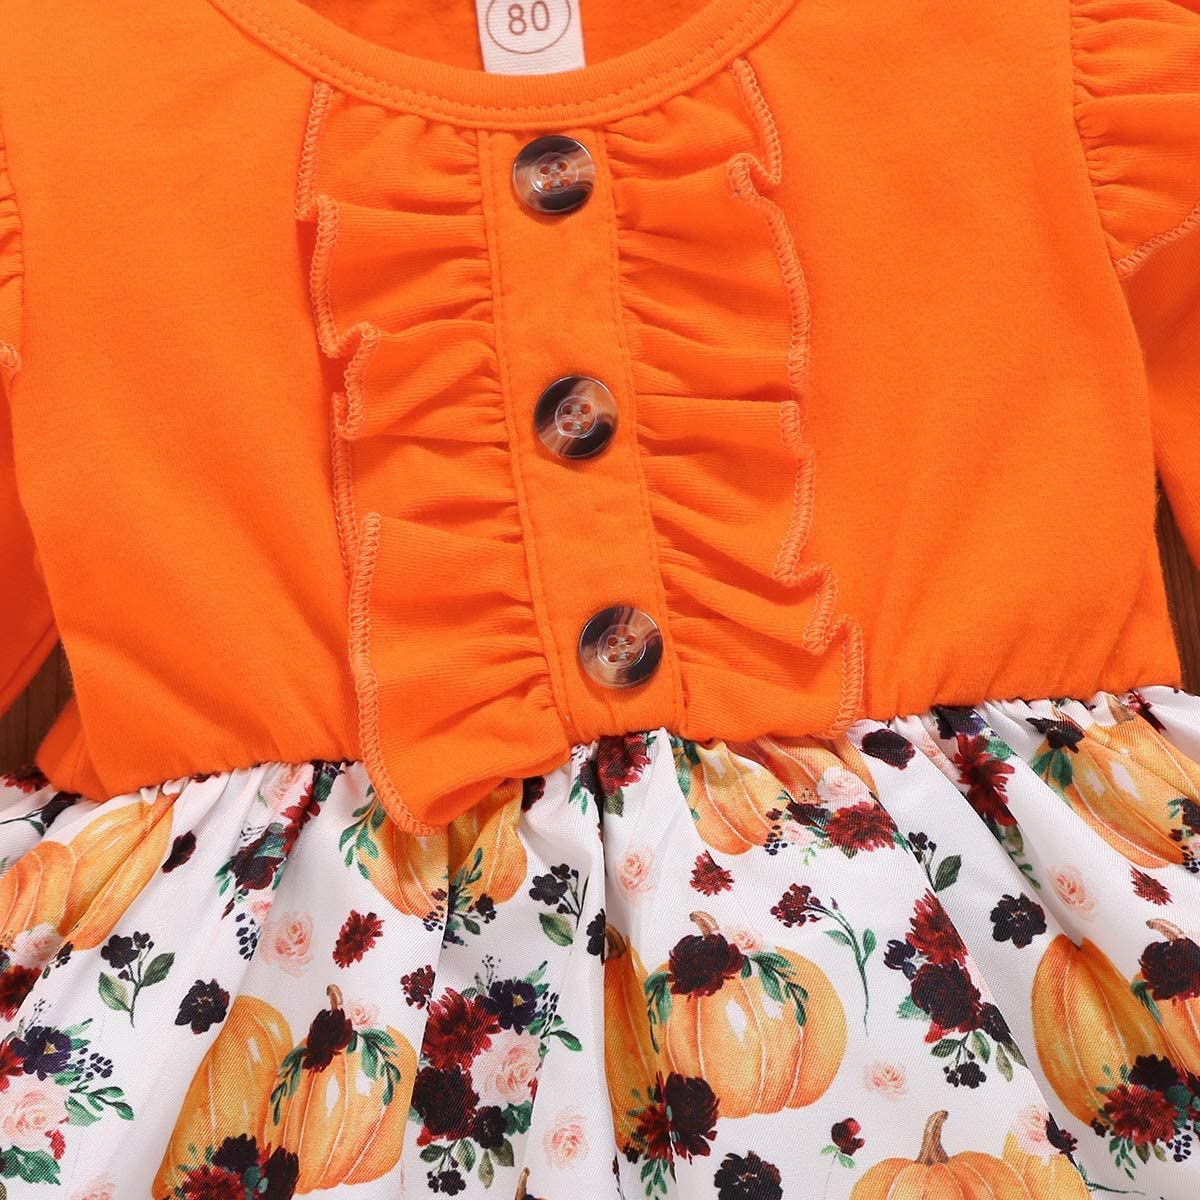 Halloween Kids Toddler Baby Girls Dresses Pumpkin Ghost Spider Bell Sleeve Dress Outfit Fall Clothes